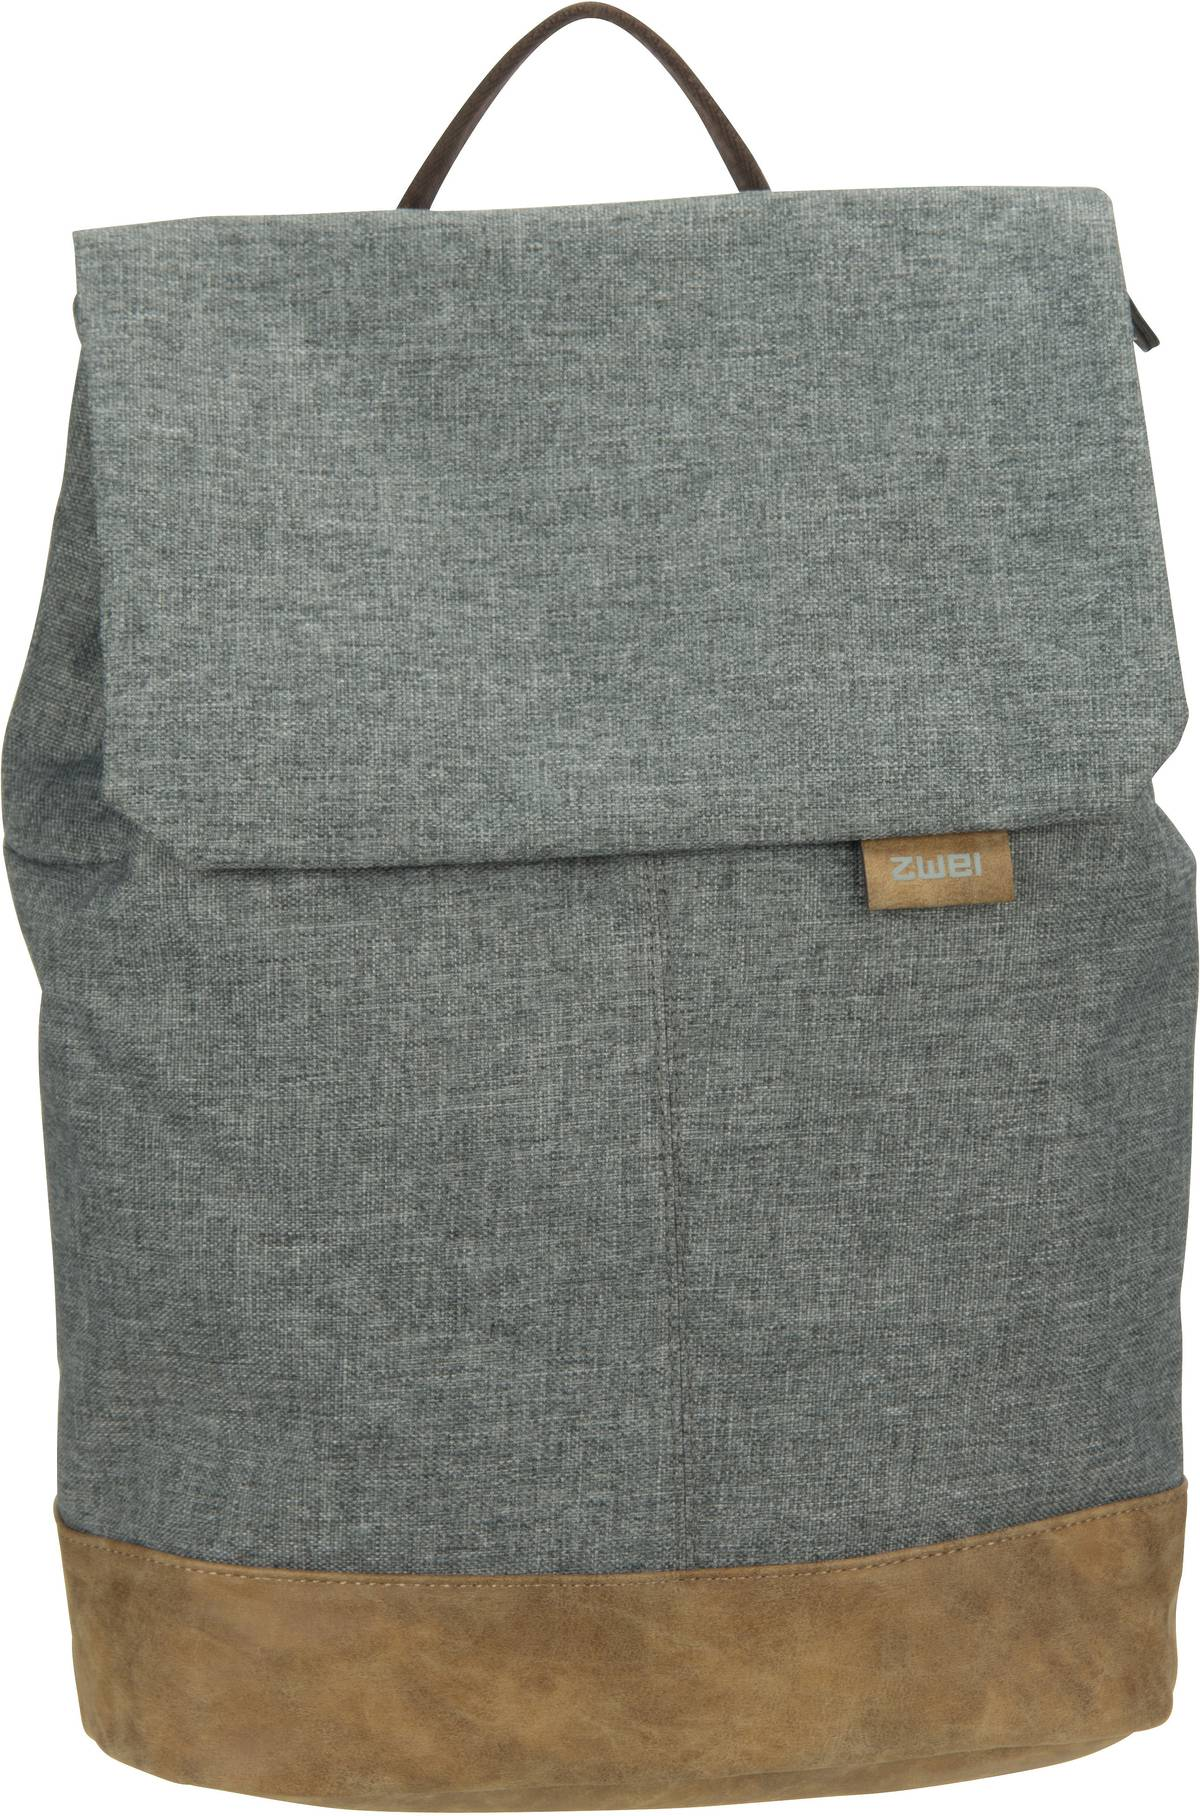 Rucksack / Daypack Olli OR14 Stone (14 Liter)